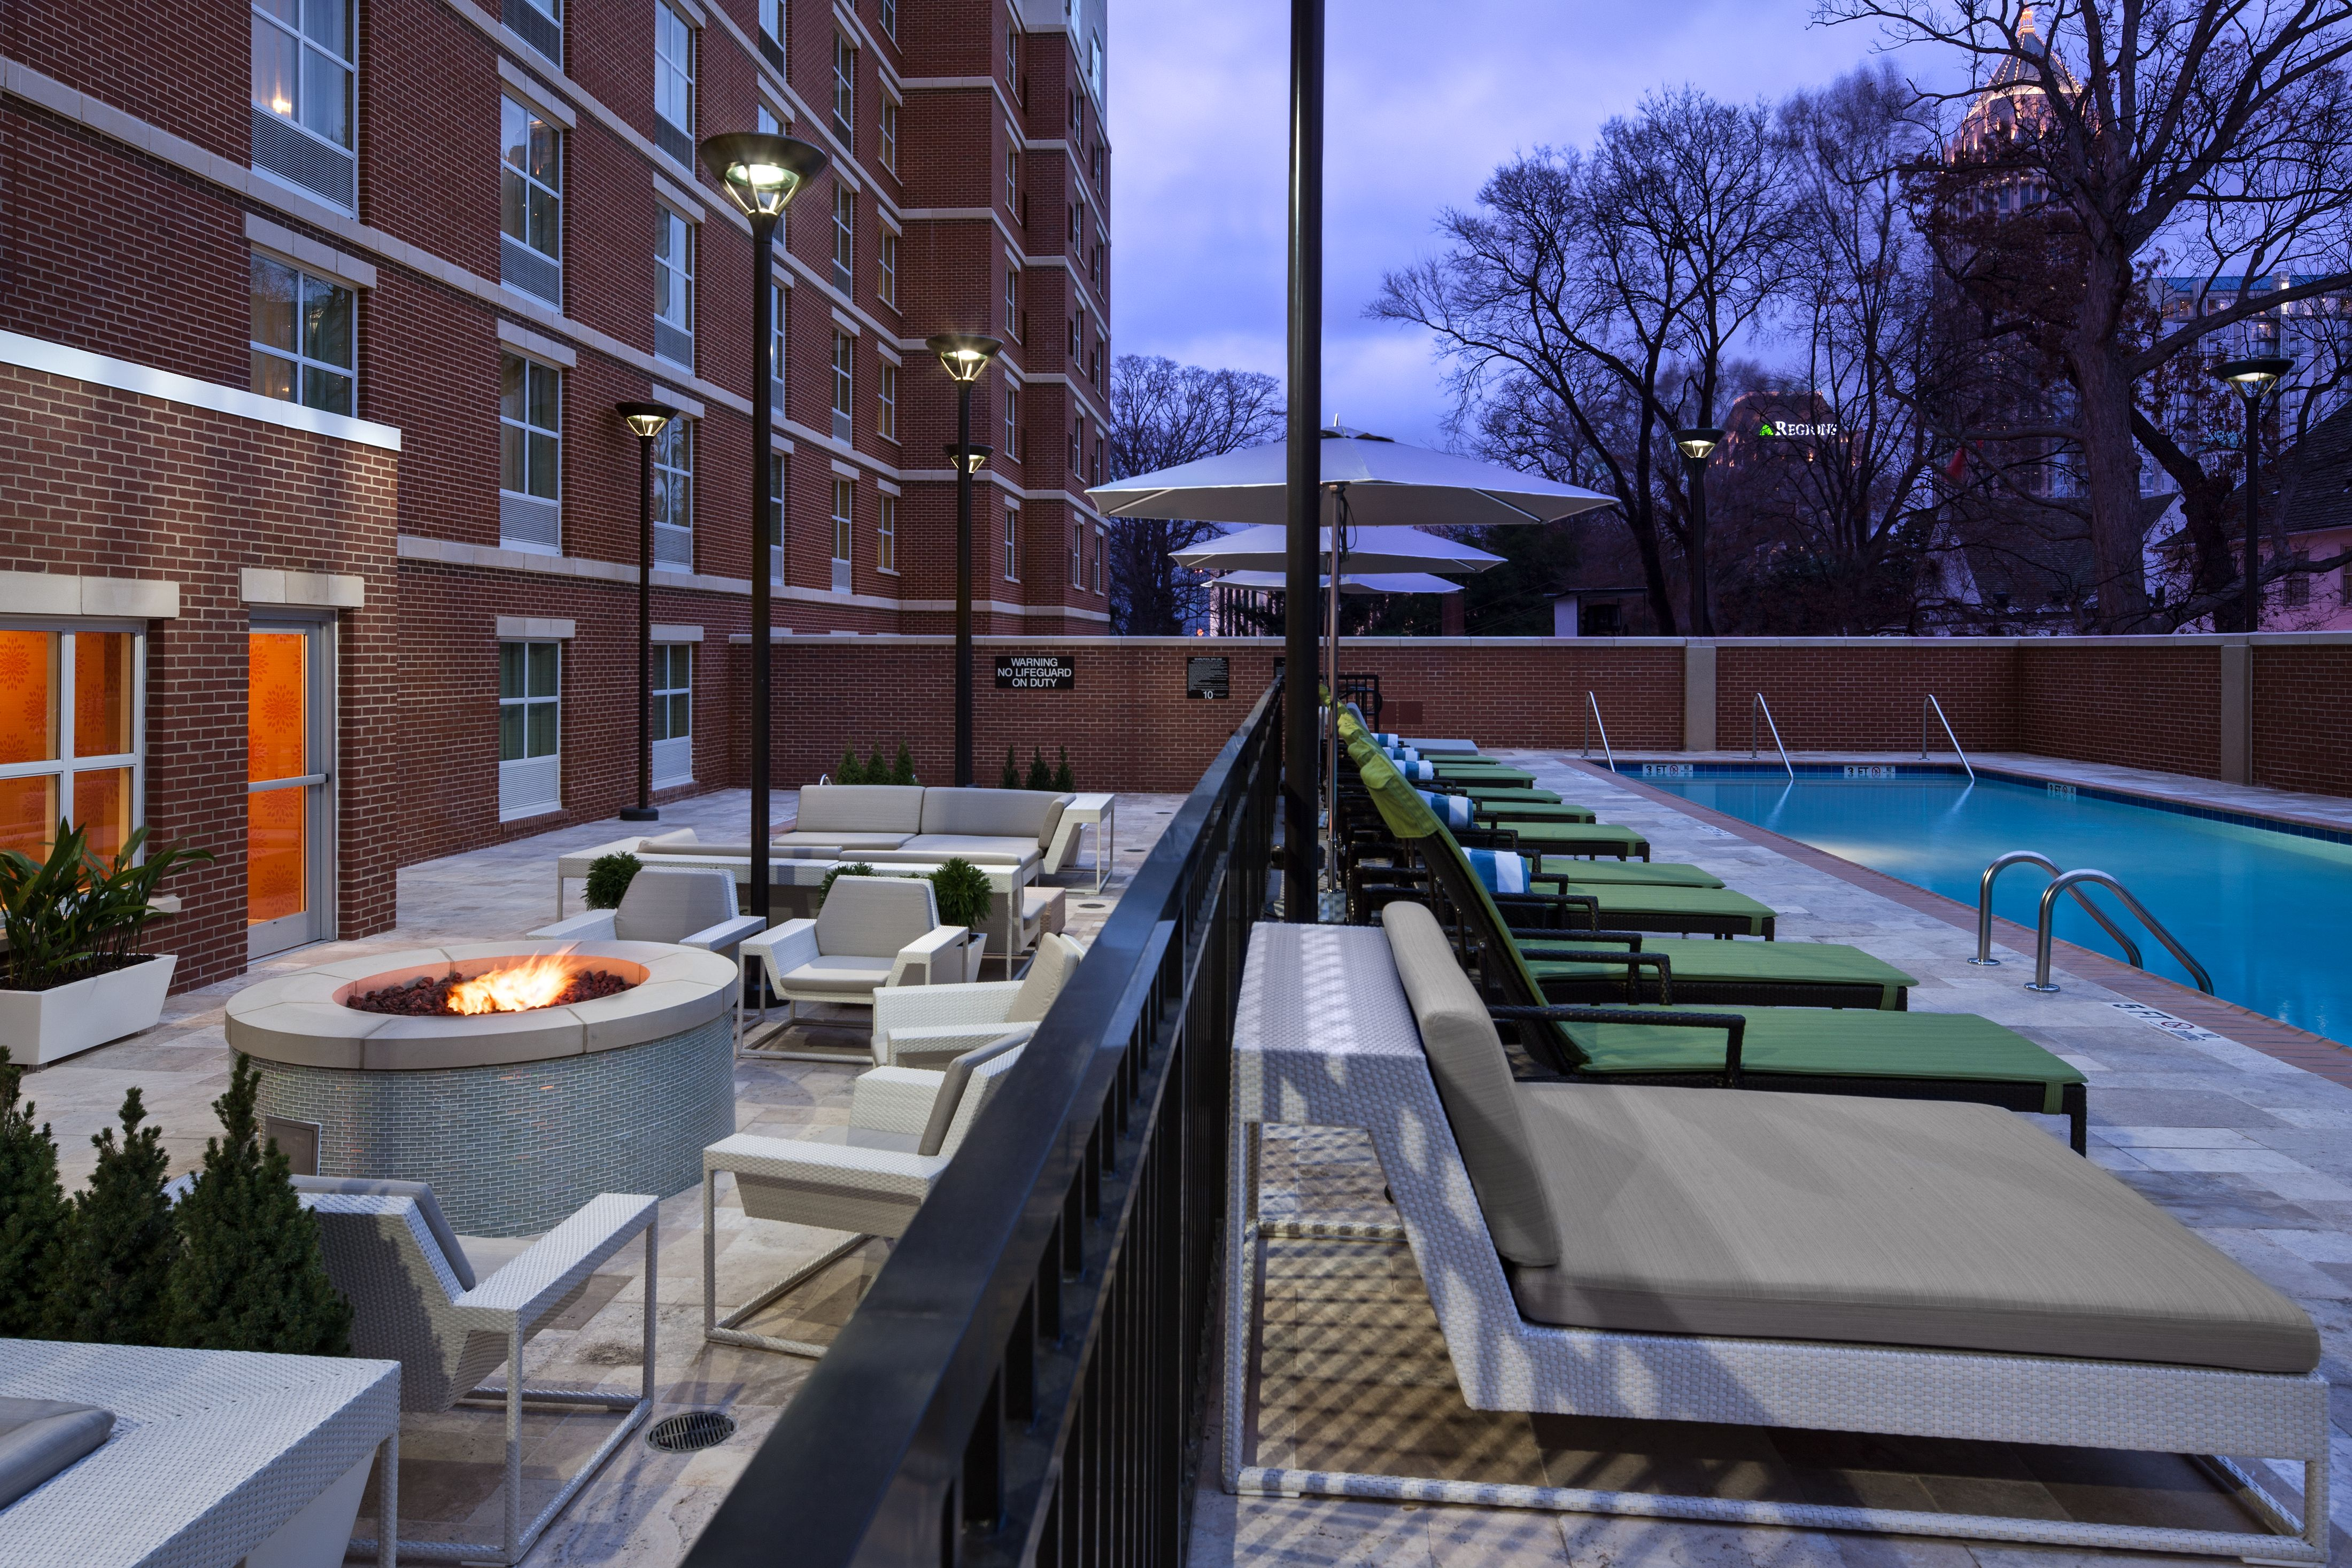 Hilton Garden Inn Amp Homewood Suites By Hilton Lpbc